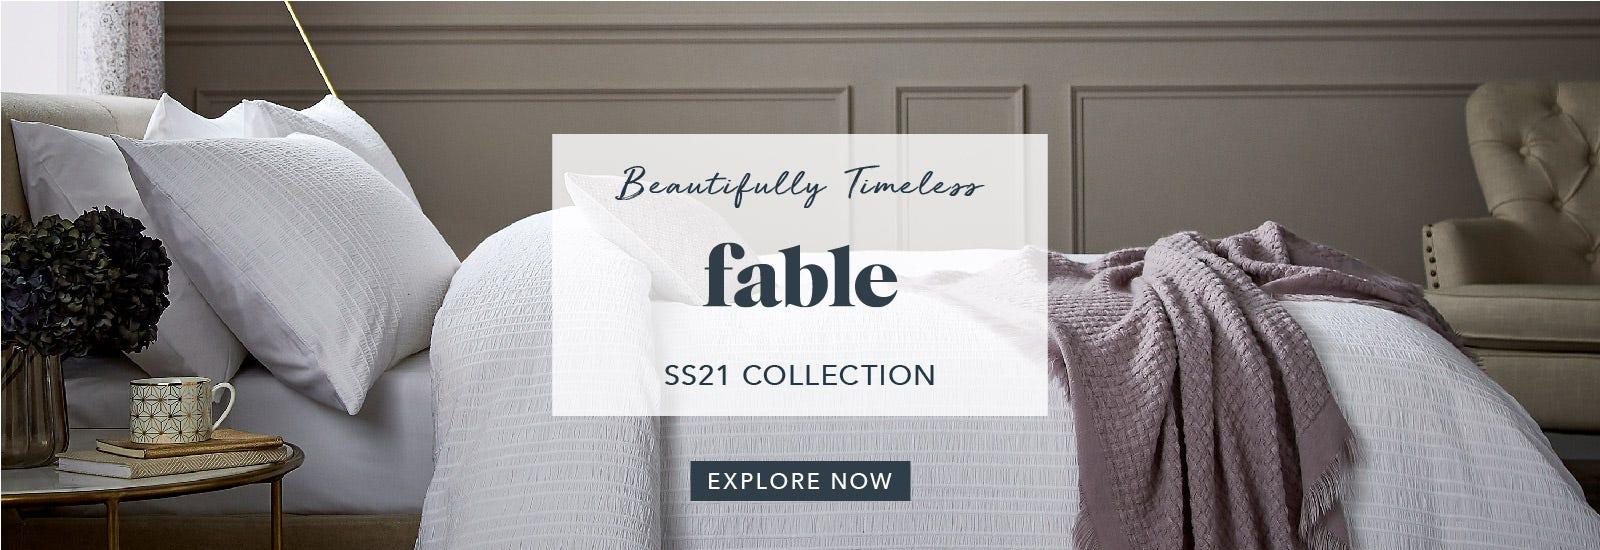 Shop Fable Bedding